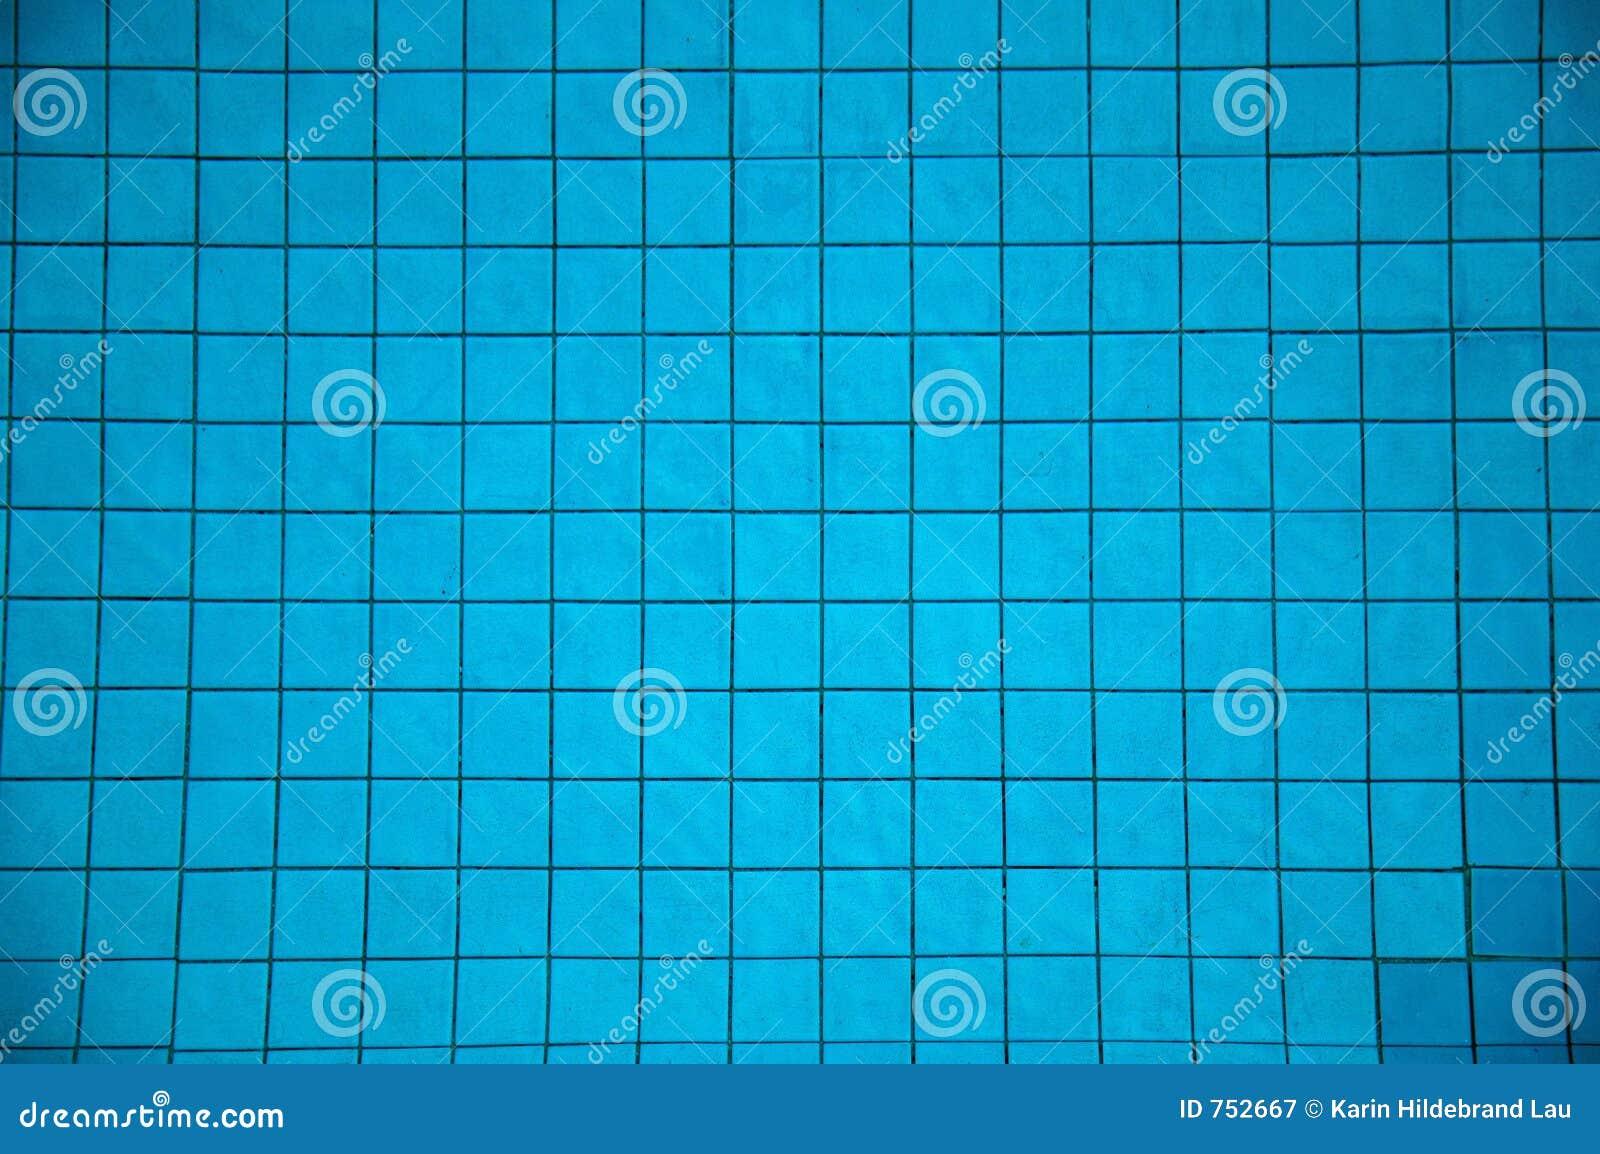 pool fliesen lizenzfreie stockfotografie bild 752667. Black Bedroom Furniture Sets. Home Design Ideas